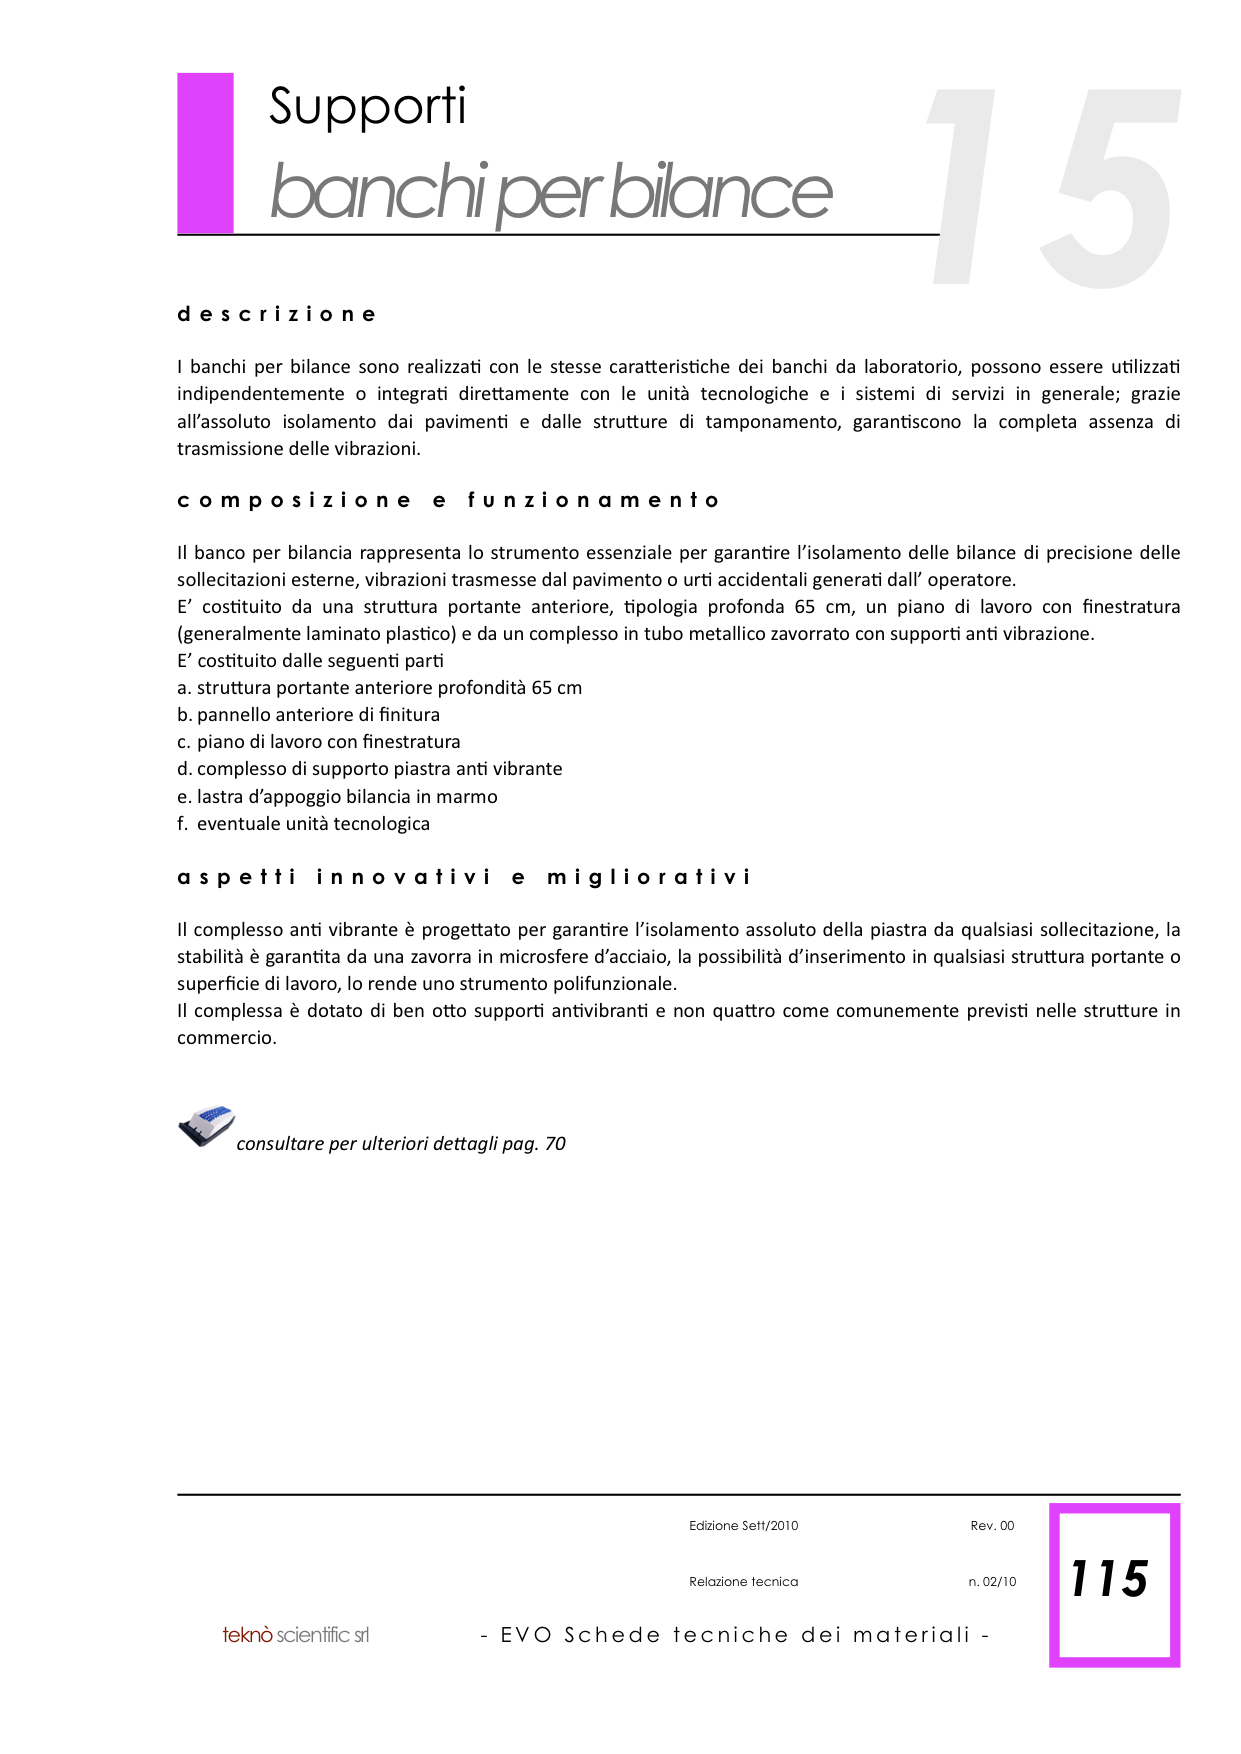 EVO Schede Tecniche materiali copia 5.png